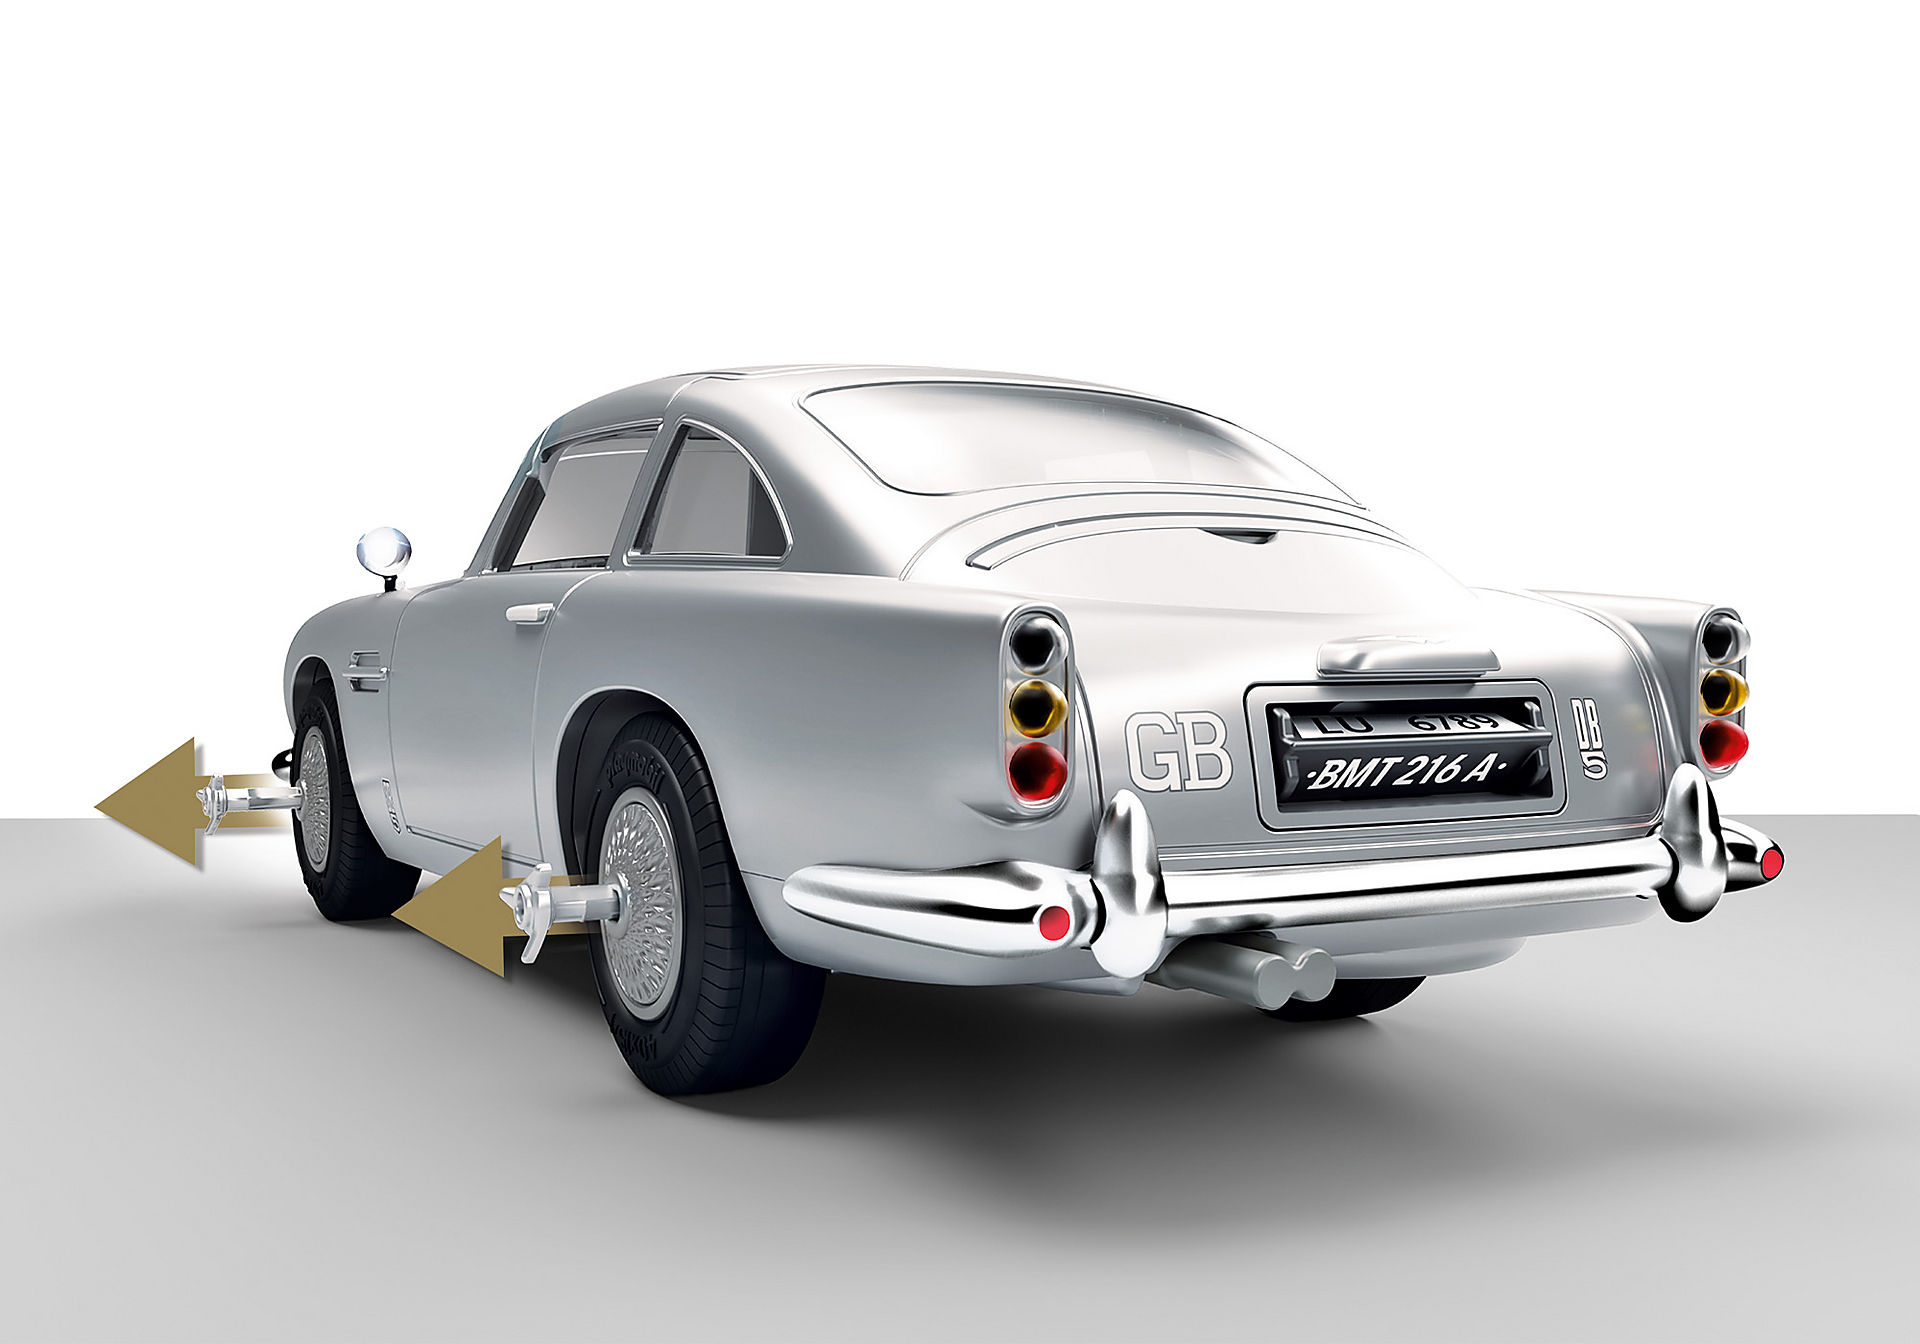 70578 James Bond Aston Martin DB5 - Goldfinger Edition zoom image8